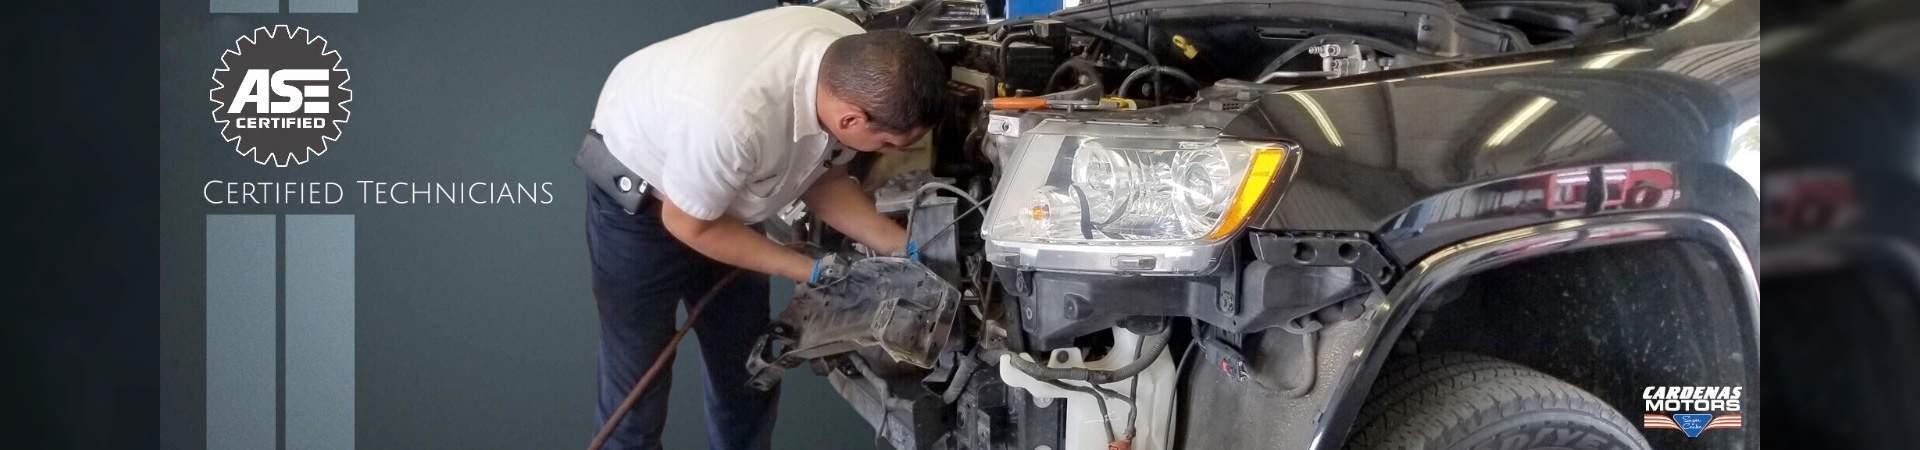 Used car dealership brownsville tx cardenas motors for Cardenas motors in brownsville texas